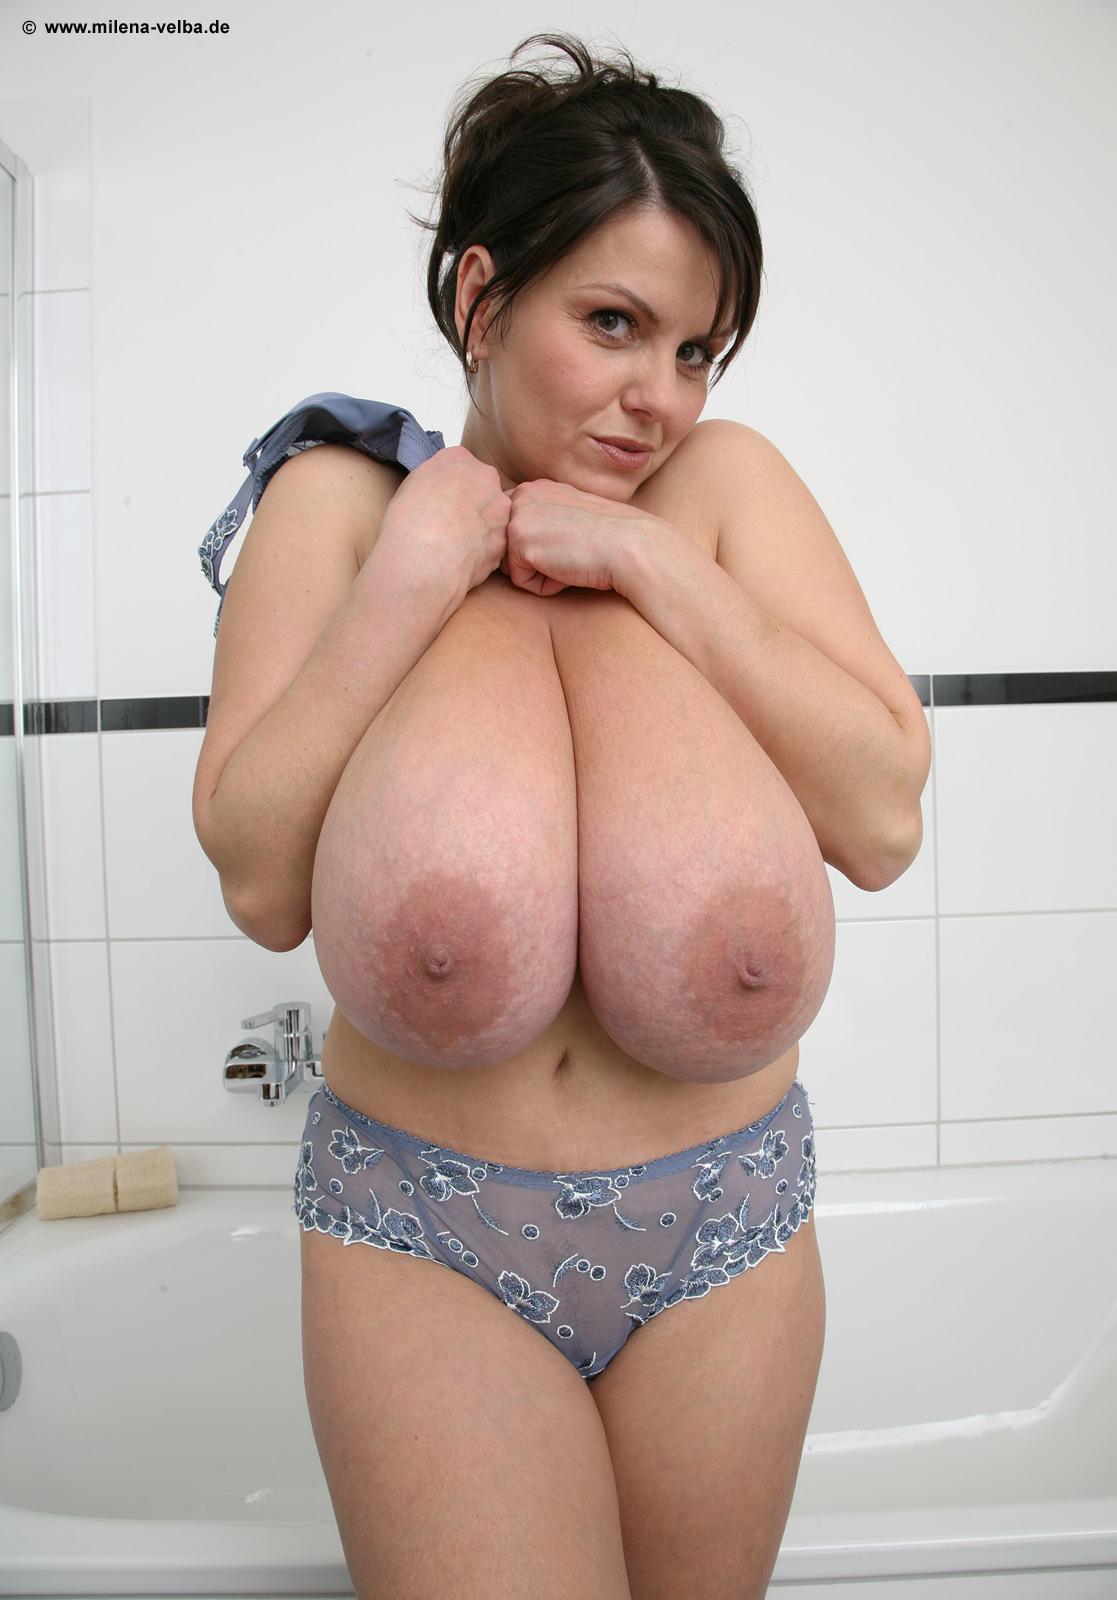 milena velba nude Milena Velba Complete Nude 99